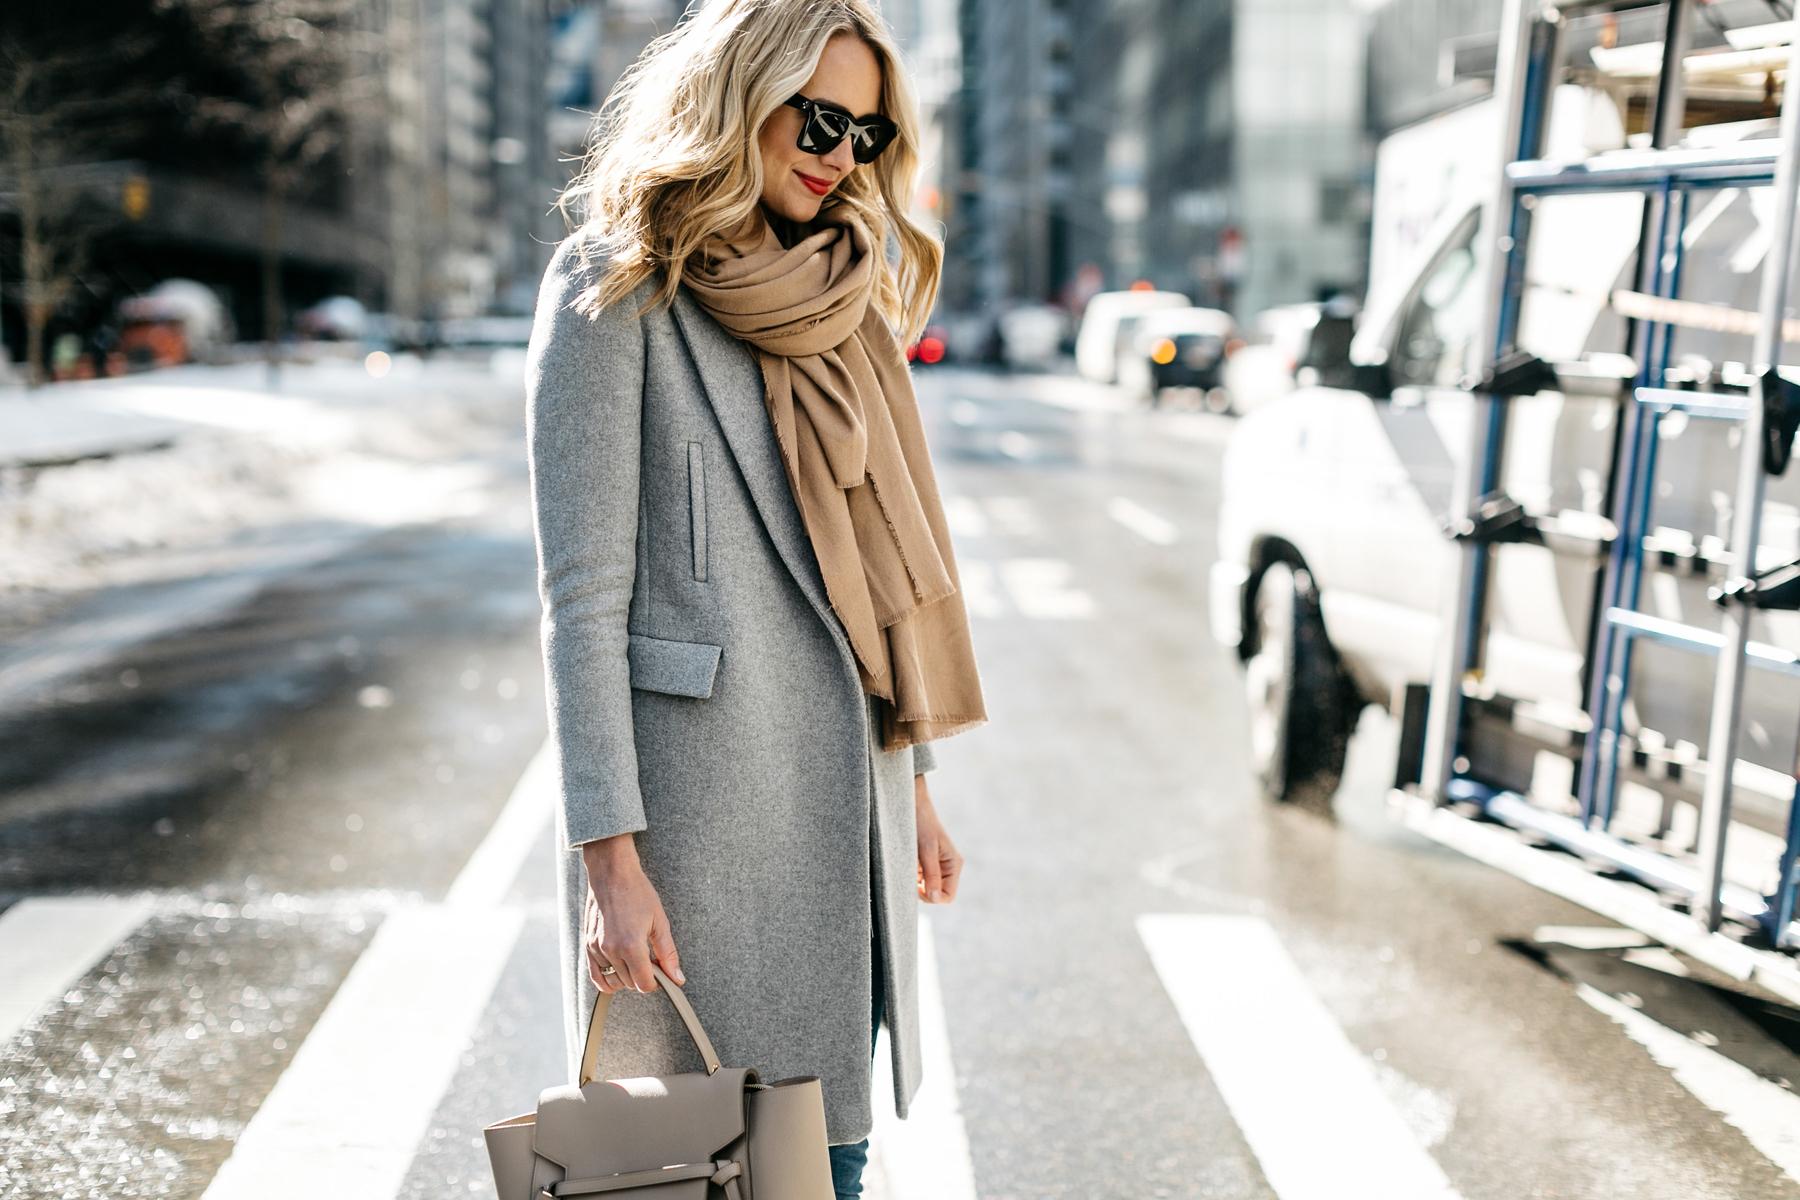 NYFW Fall/Winter 2017, Street Style, Grey Coat, Tan Blanket Scarf, Celine Tie Handbag